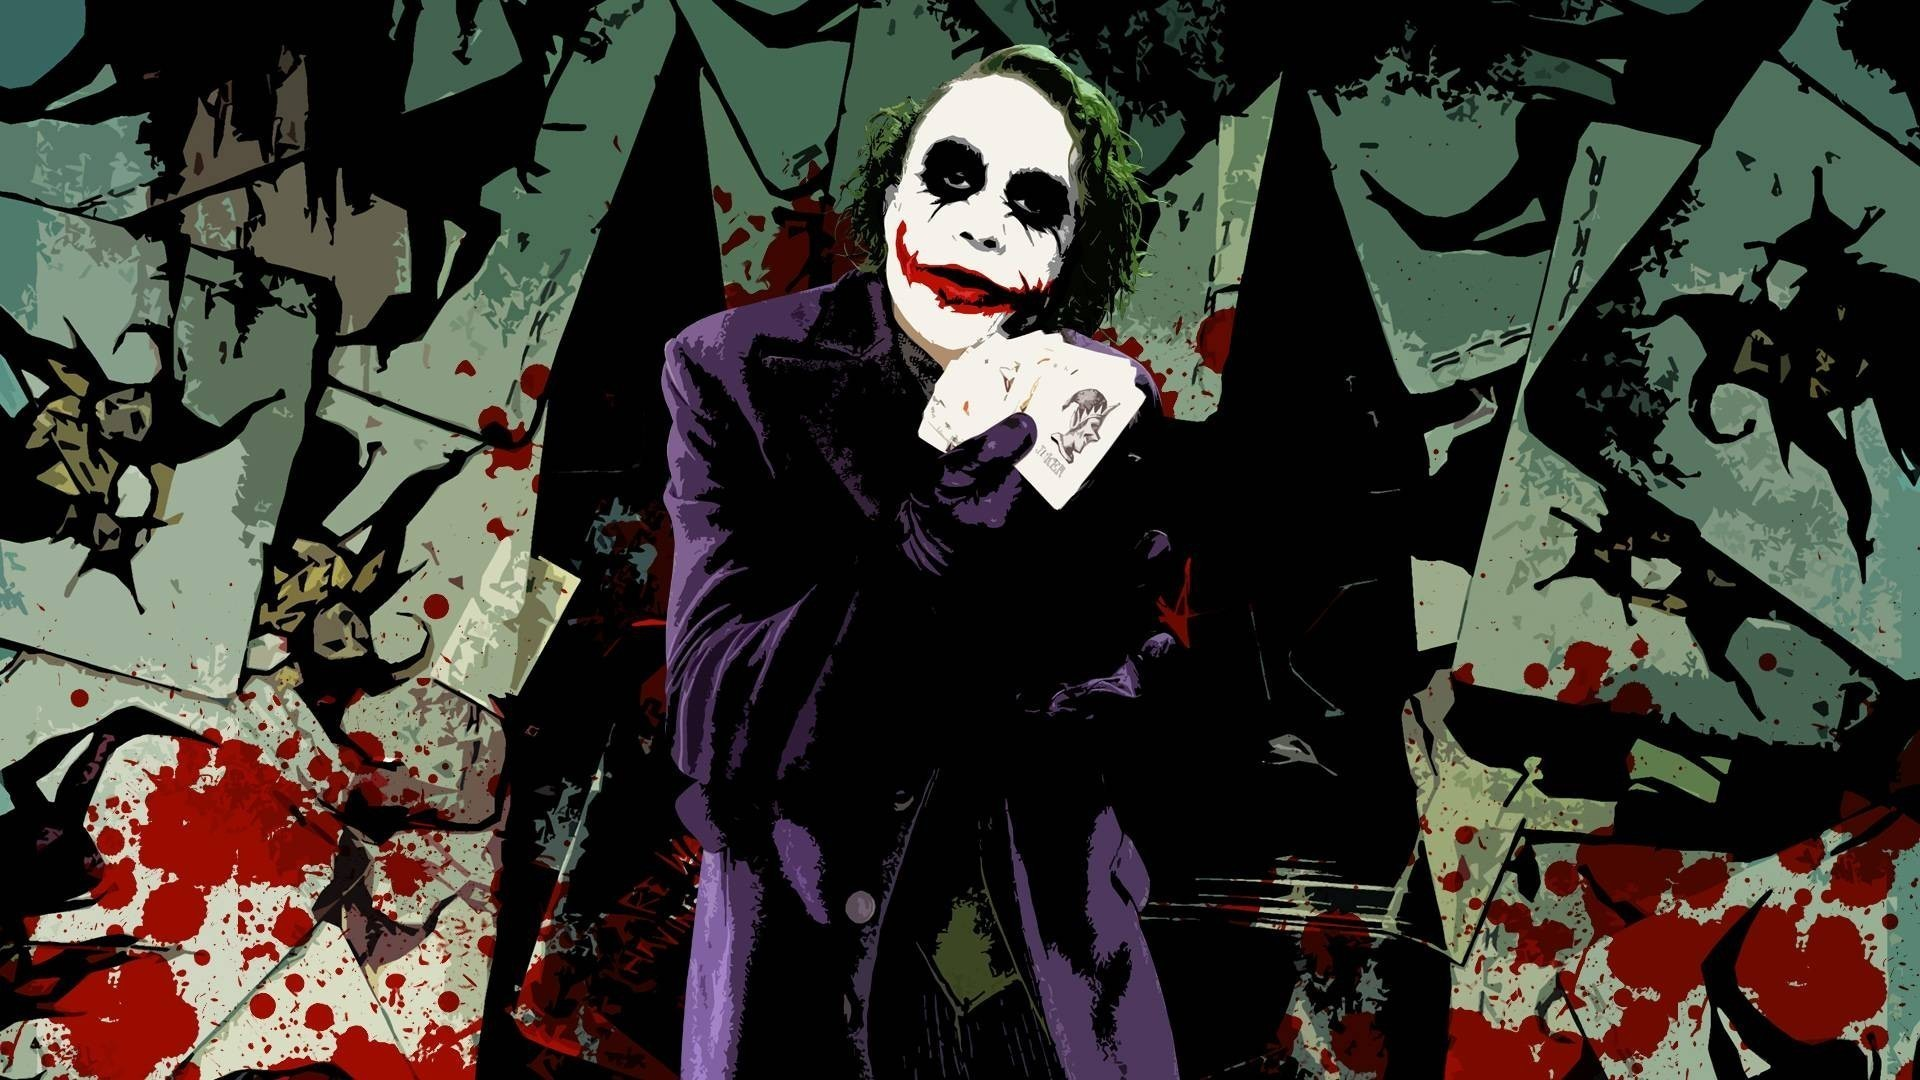 the joker wallpaper HD Download 1600×1200 The Joker Wallpaper (54 Wallpapers)  |